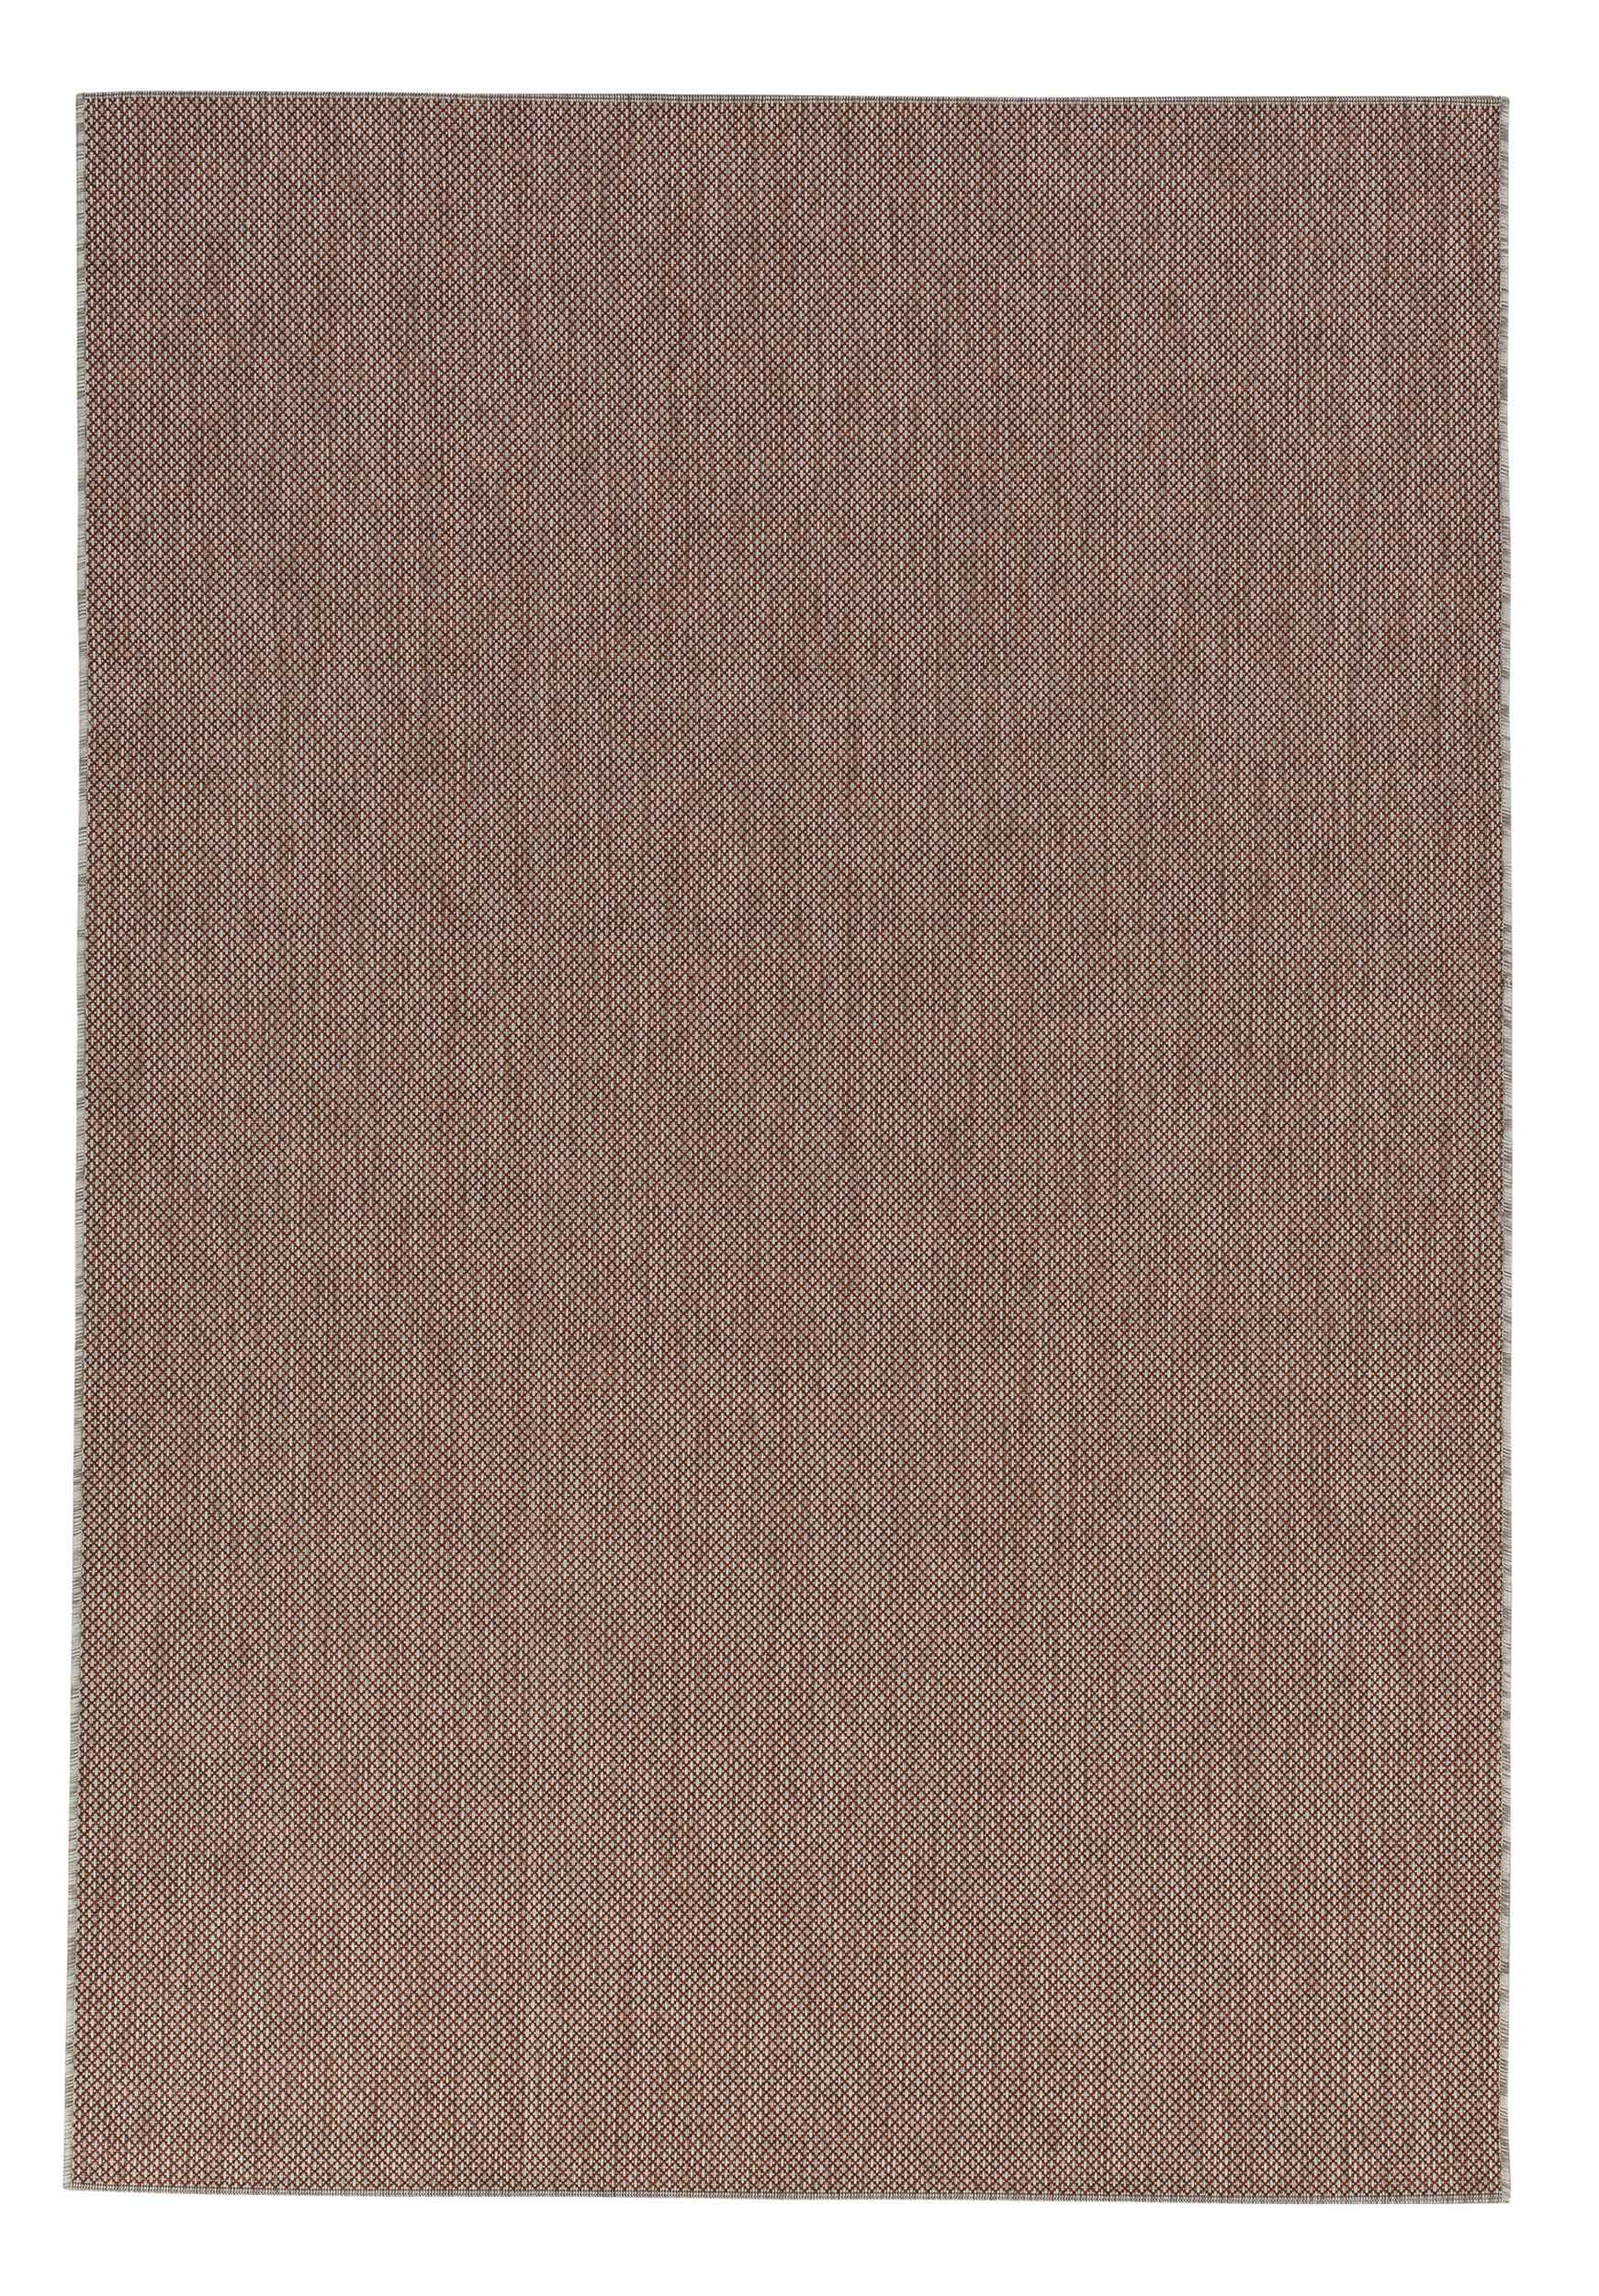 Outdoor Teppich 80x150cm RHO